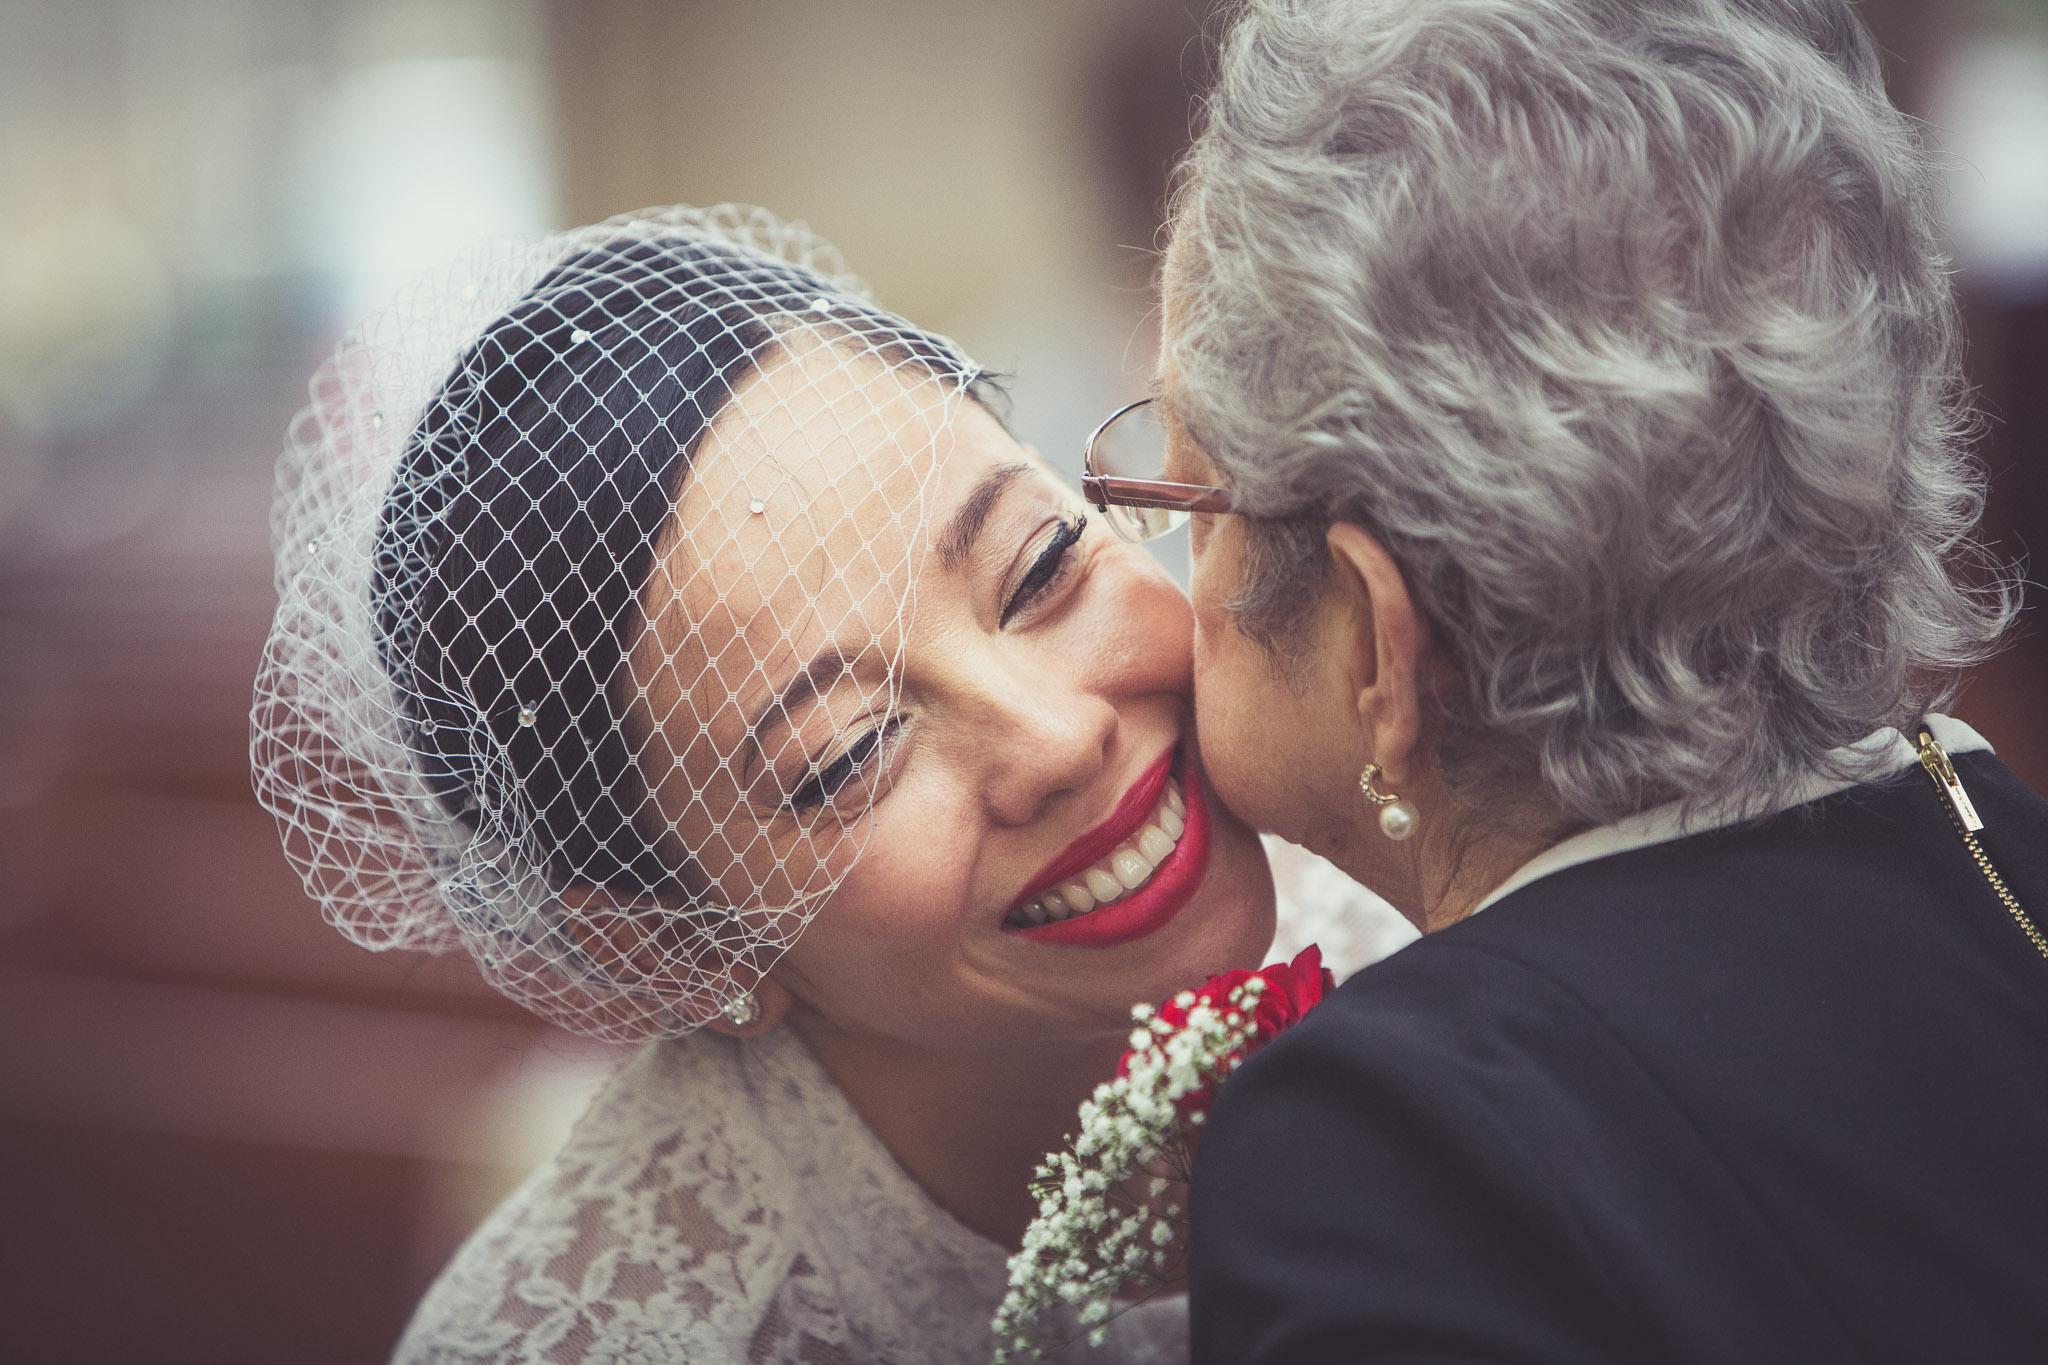 Geovanna-JP-wedding-shayne-gray-web-2493.jpg